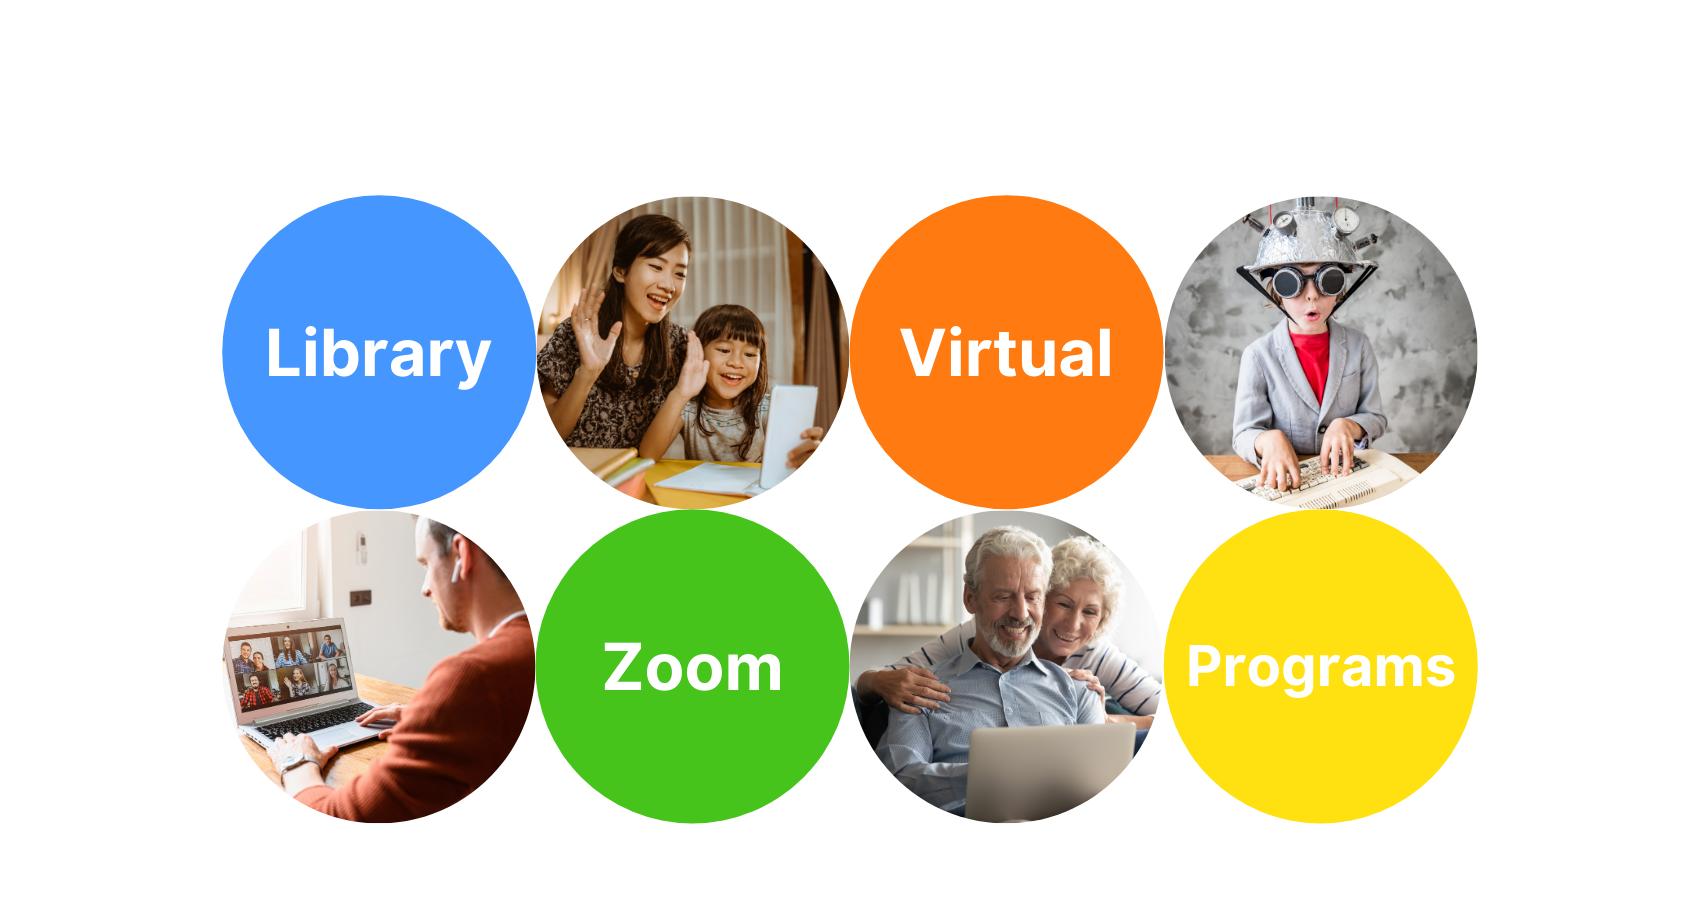 Zoom Library Programs